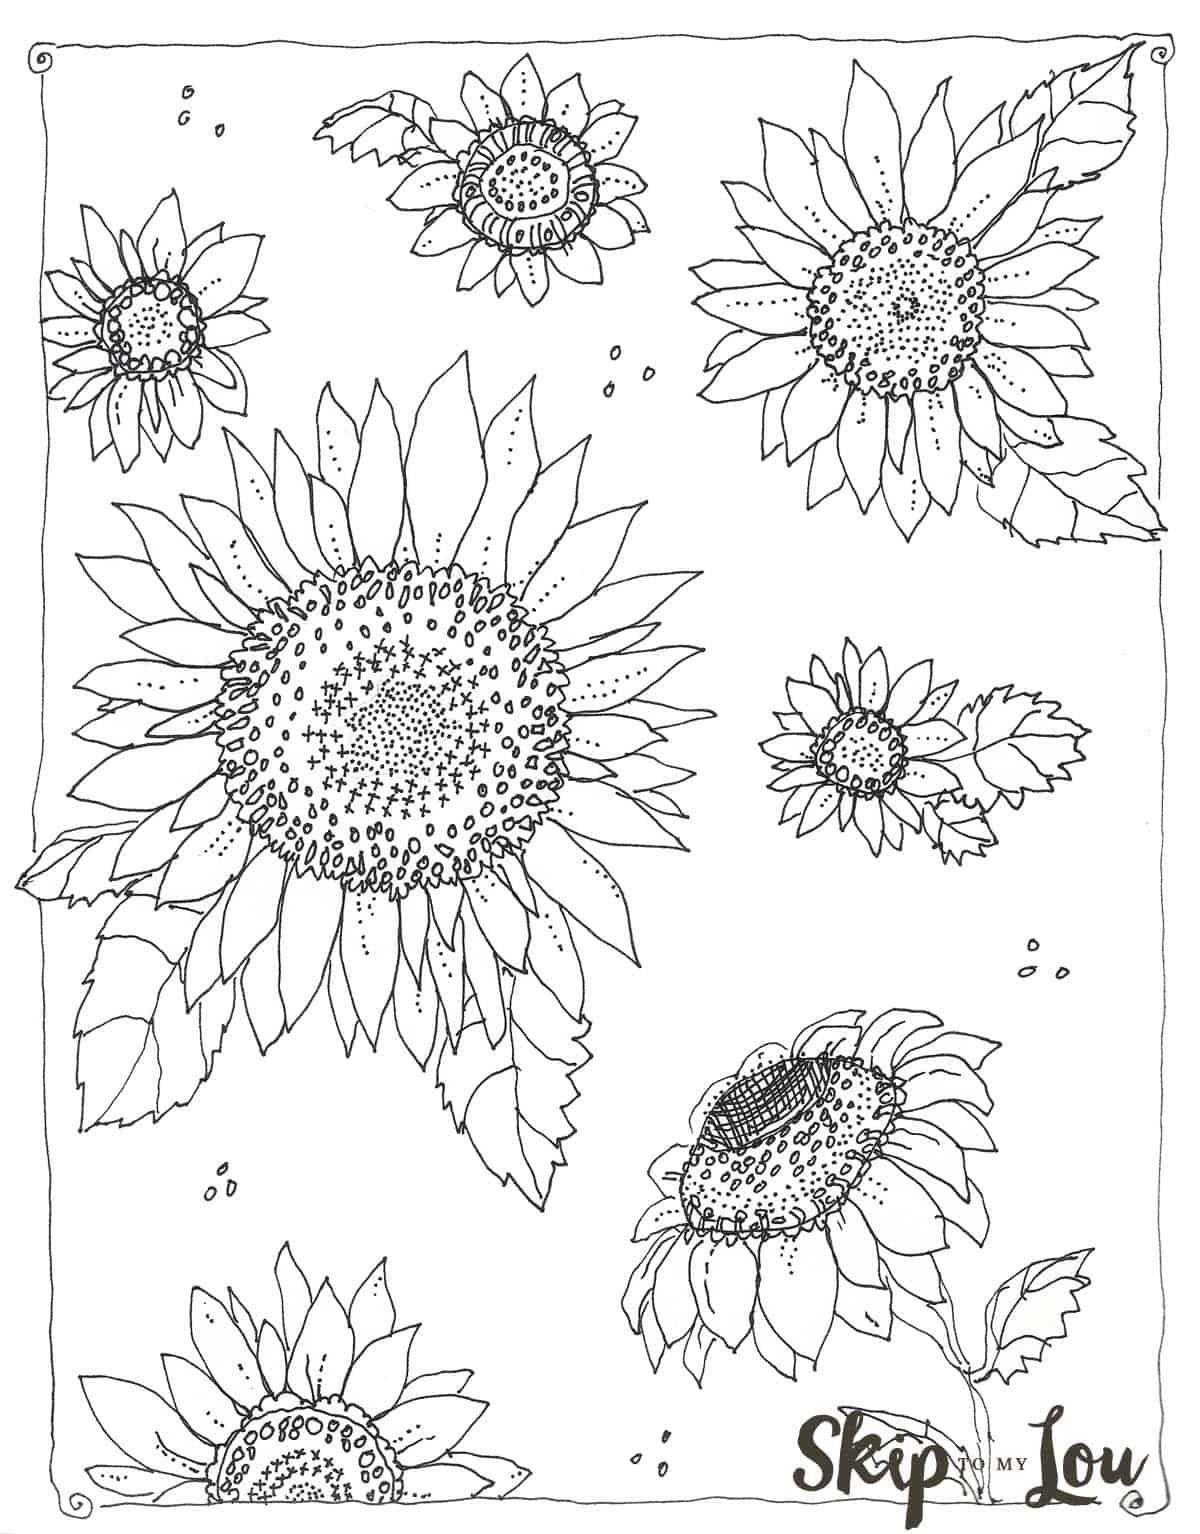 Sunflower Coloring Page Sunflower Coloring Pages Words Coloring Book Designs Coloring Books [ 1534 x 1200 Pixel ]